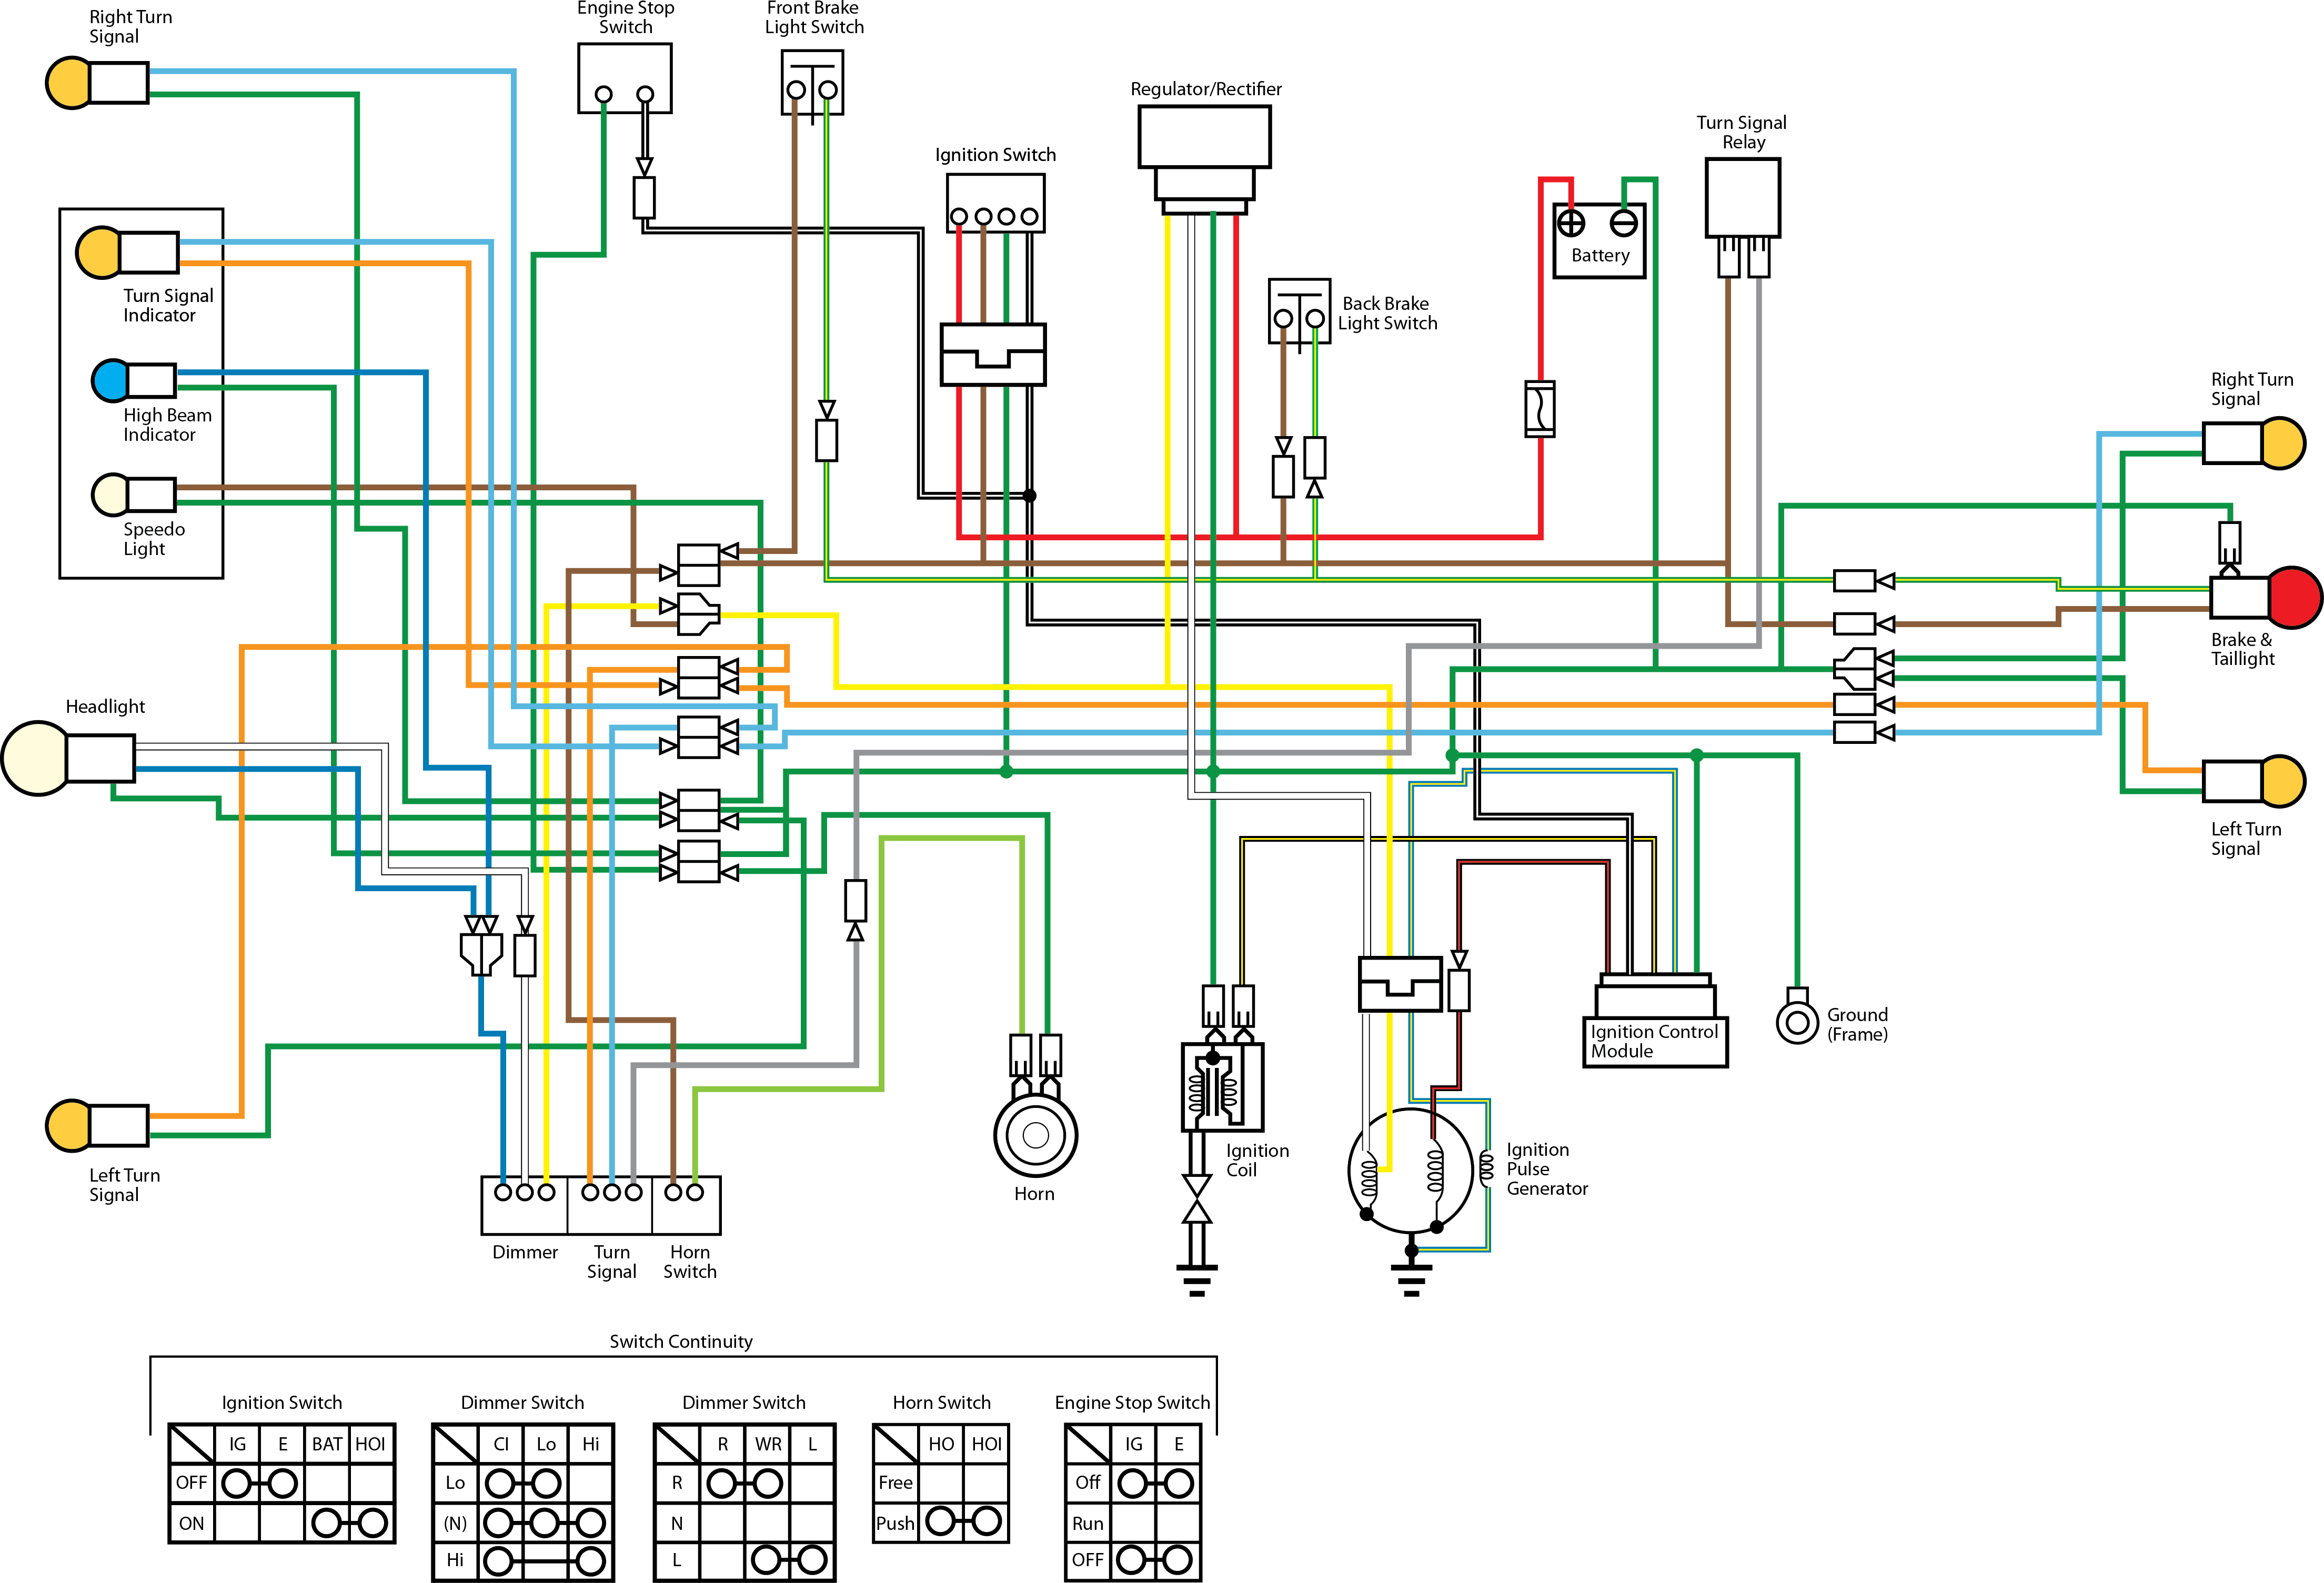 citroen c2 radio wiring diagram citroen c ignition wiring ... on